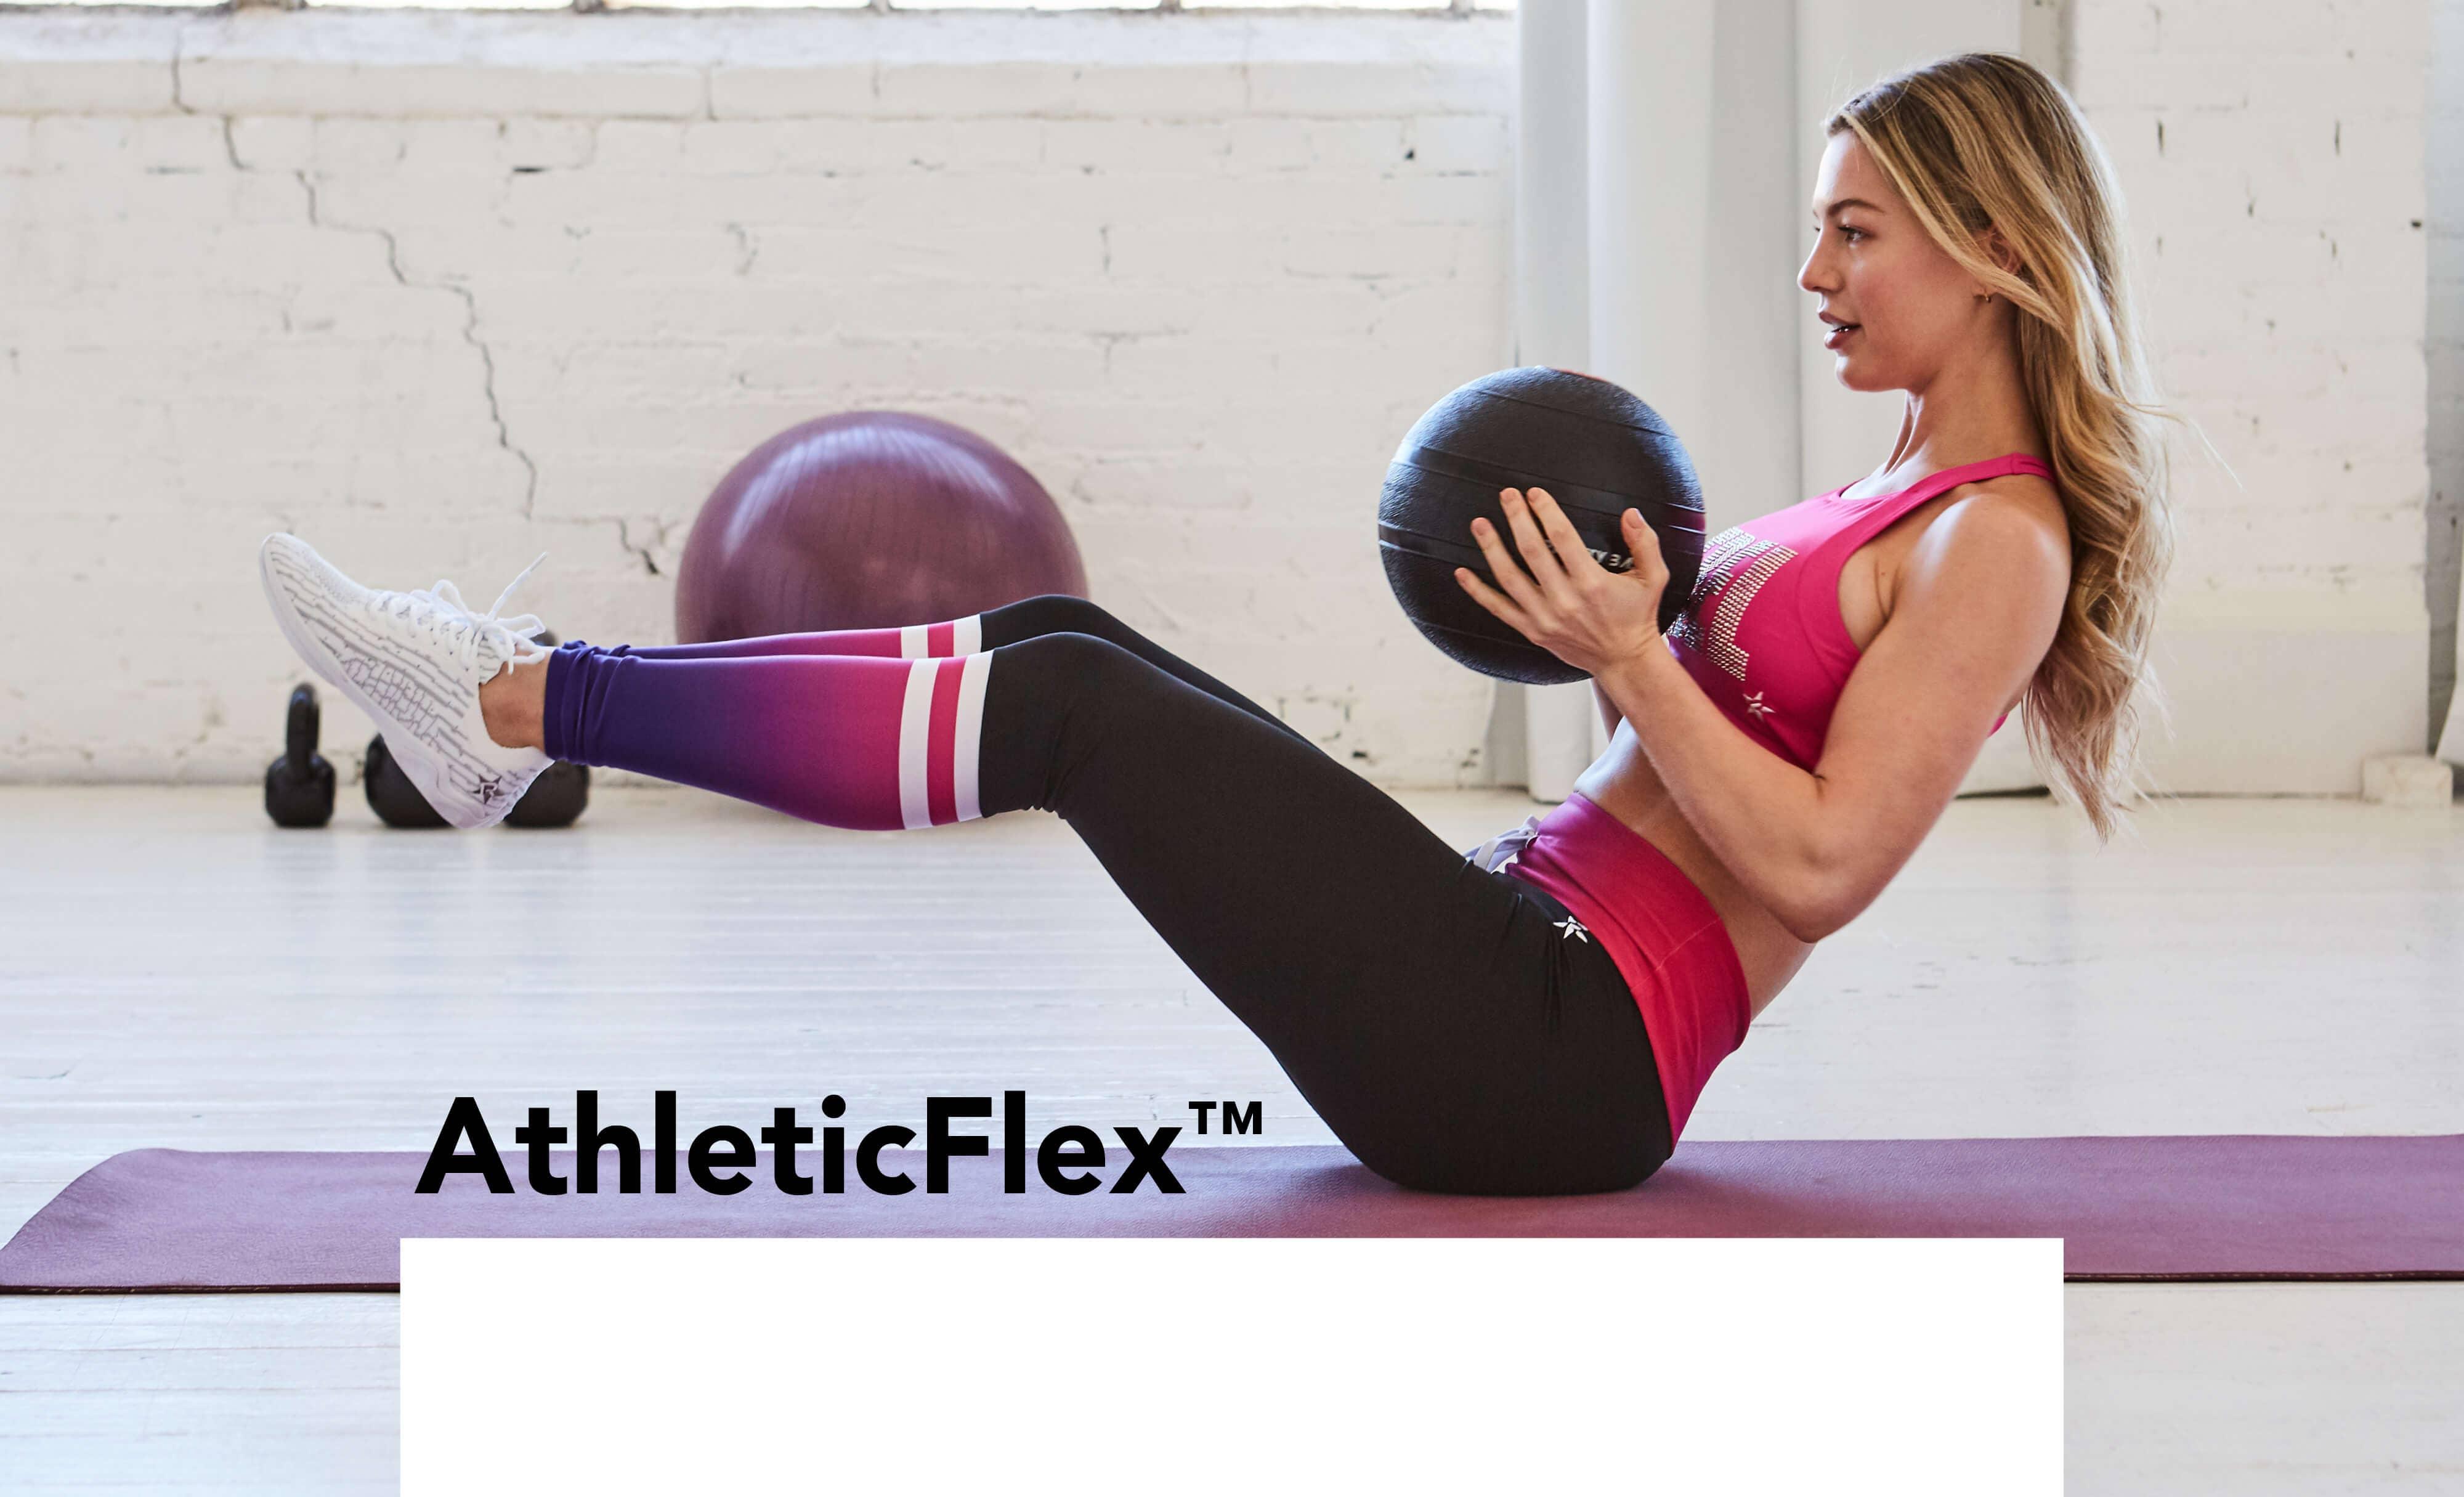 AthleticFlex